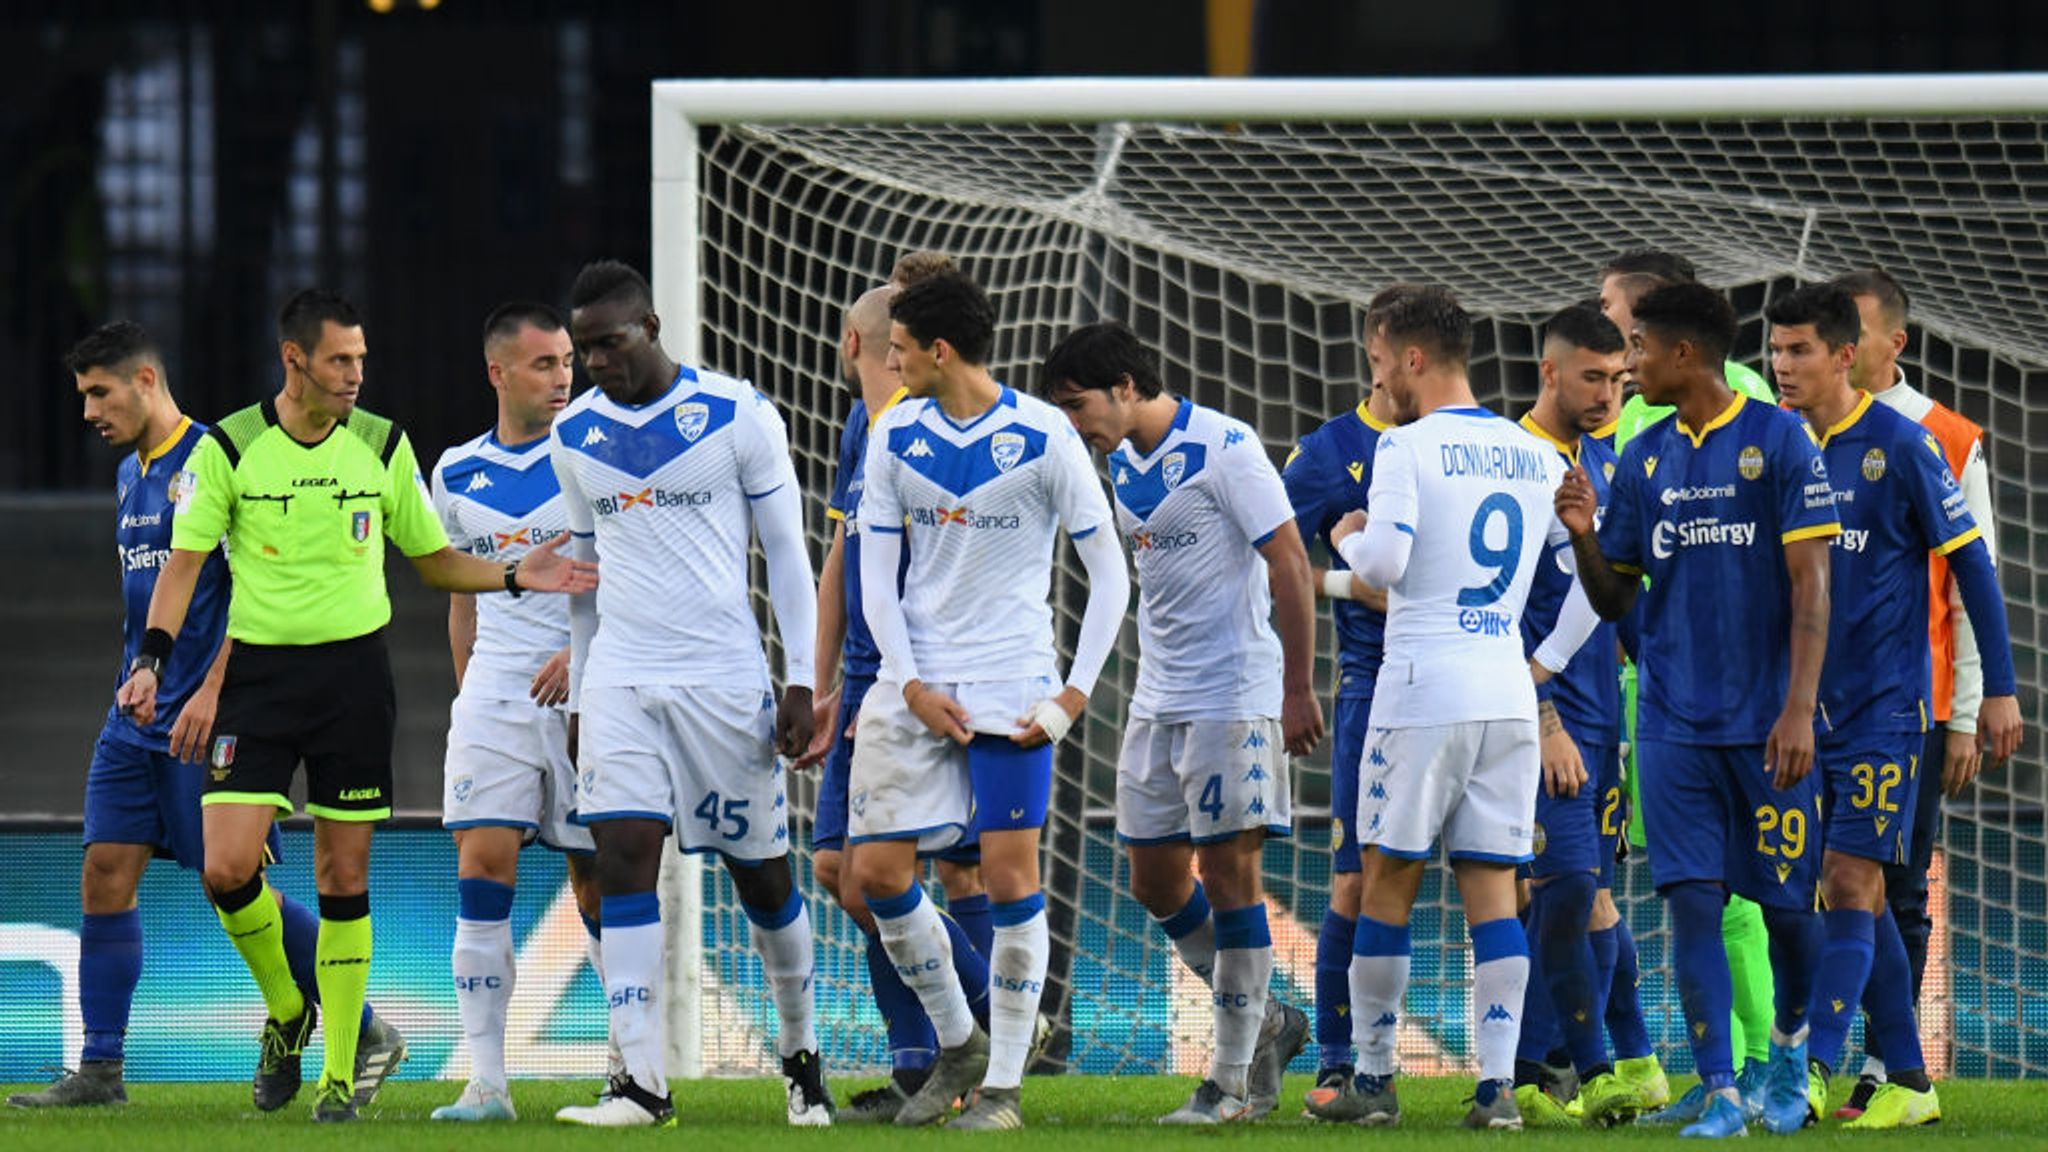 Mario Balotelli: Hellas Verona part-stadium ban suspended after abuse towards Brescia striker